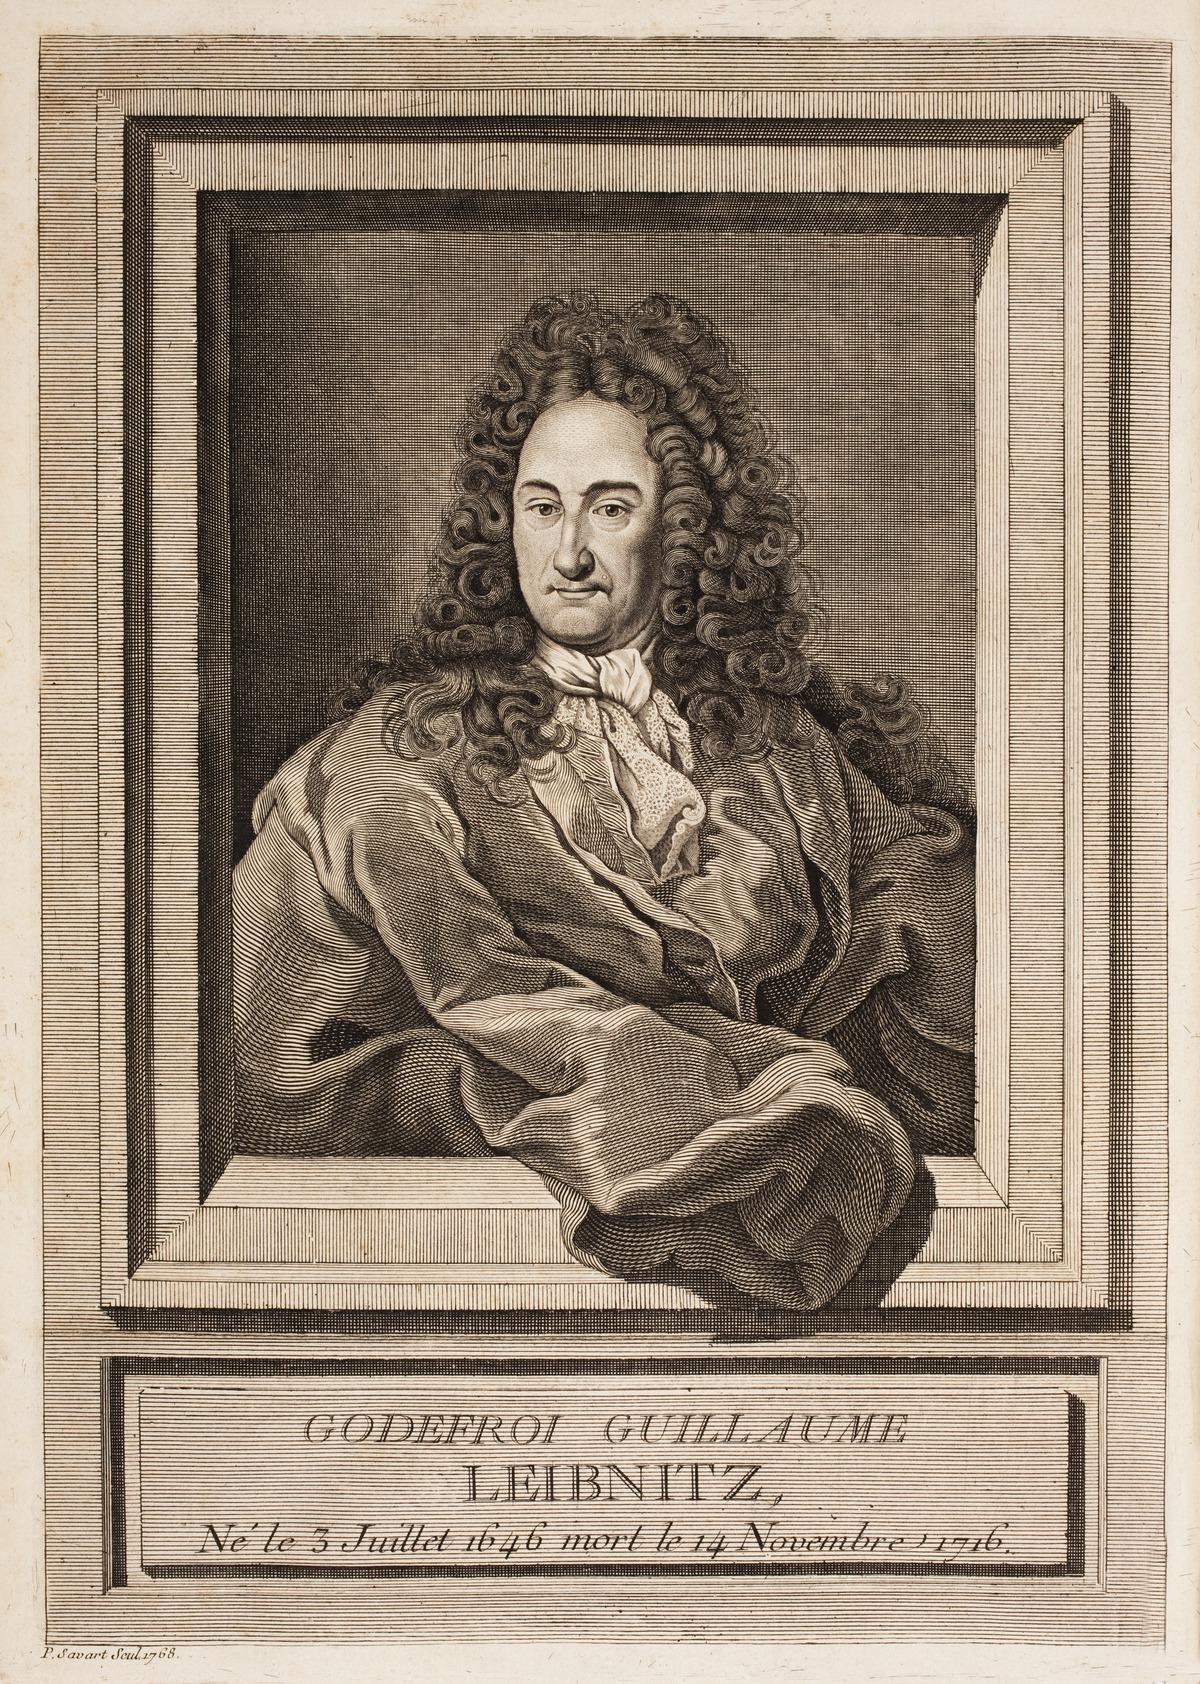 Gottfried-Wilhelm-Leibniz-Louis-Dutens-opera-omnia MG 1180.tif